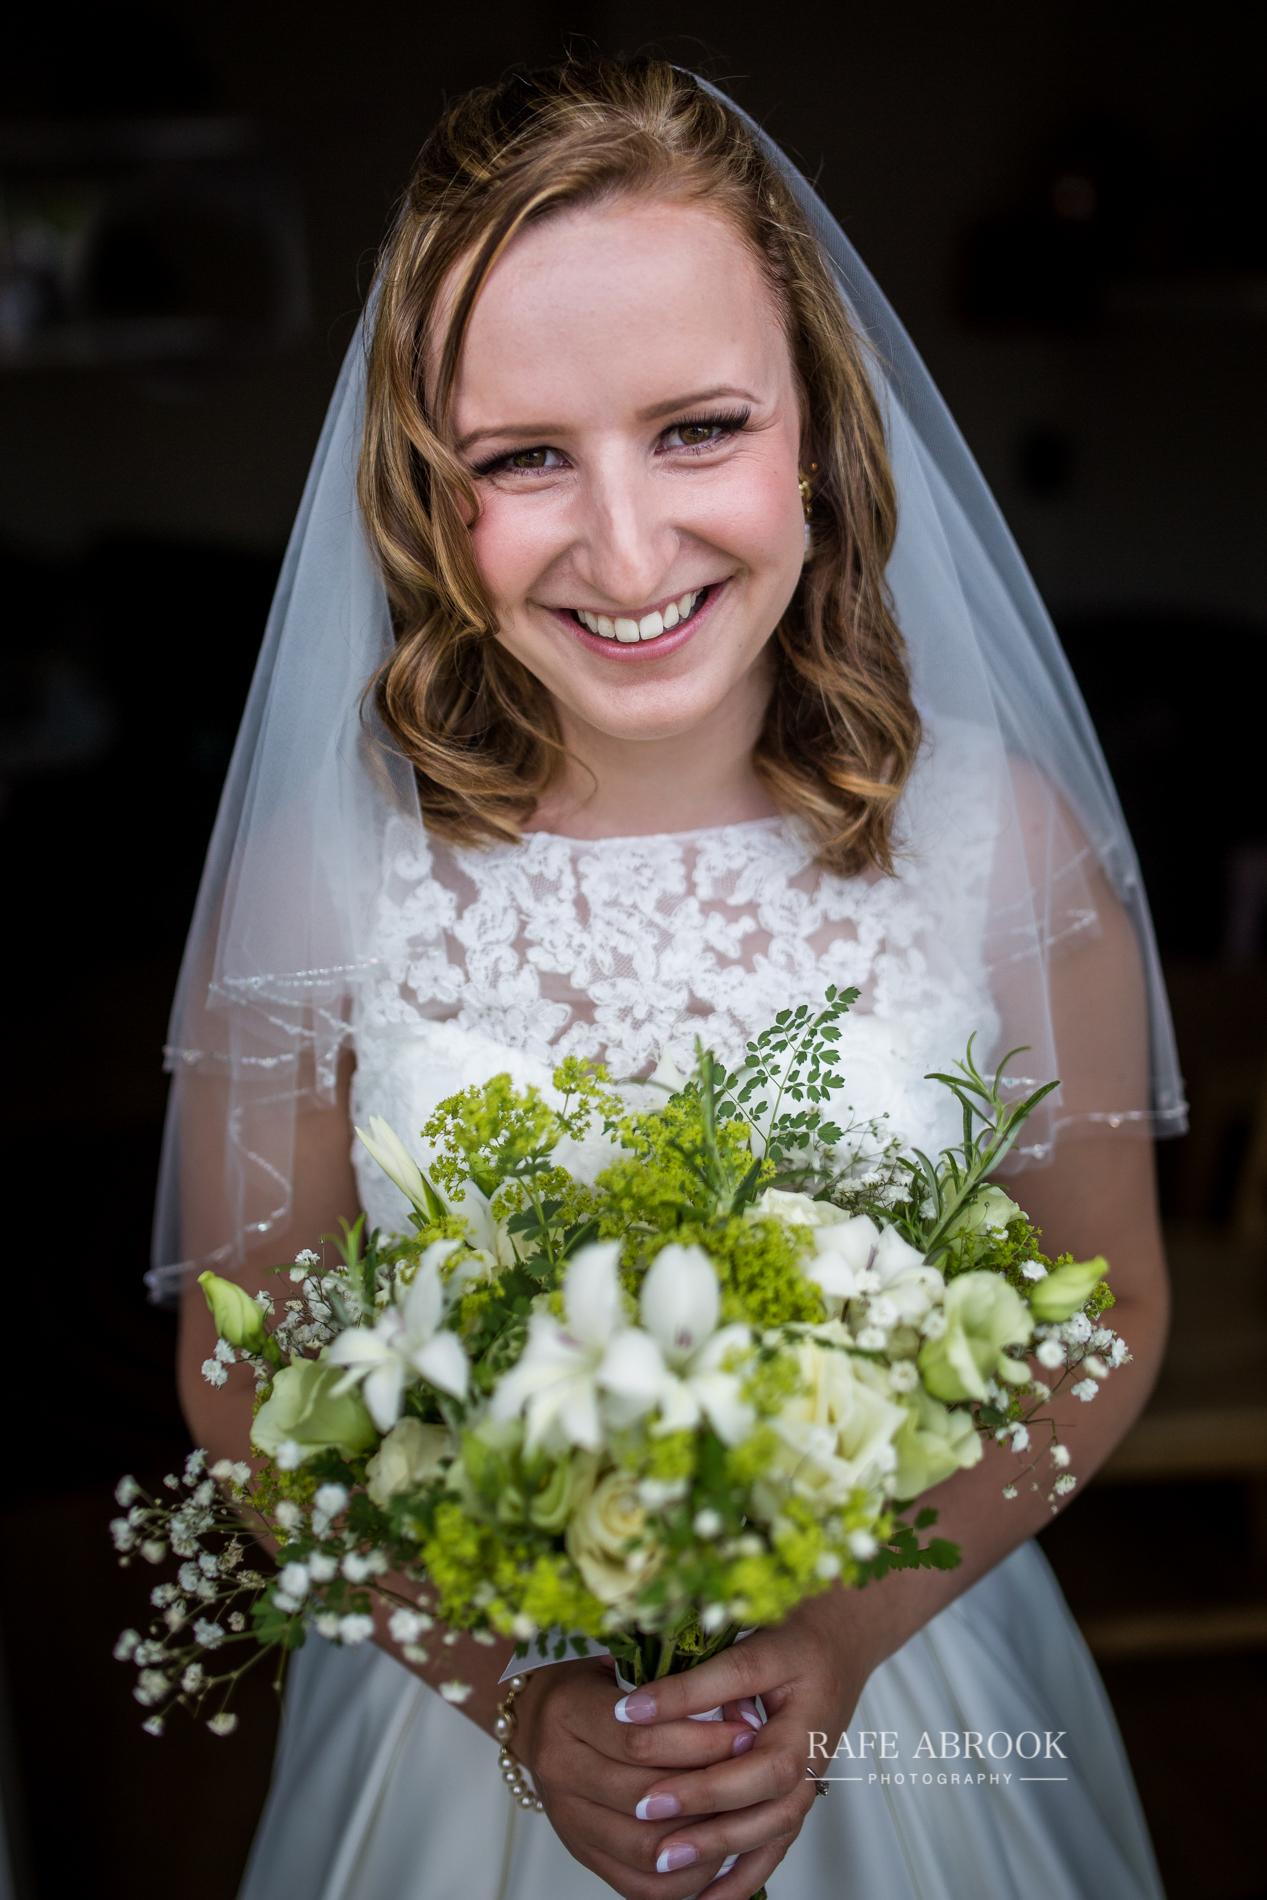 wedding photographer hertfordshire noke thistle hotel st albans -1084.jpg